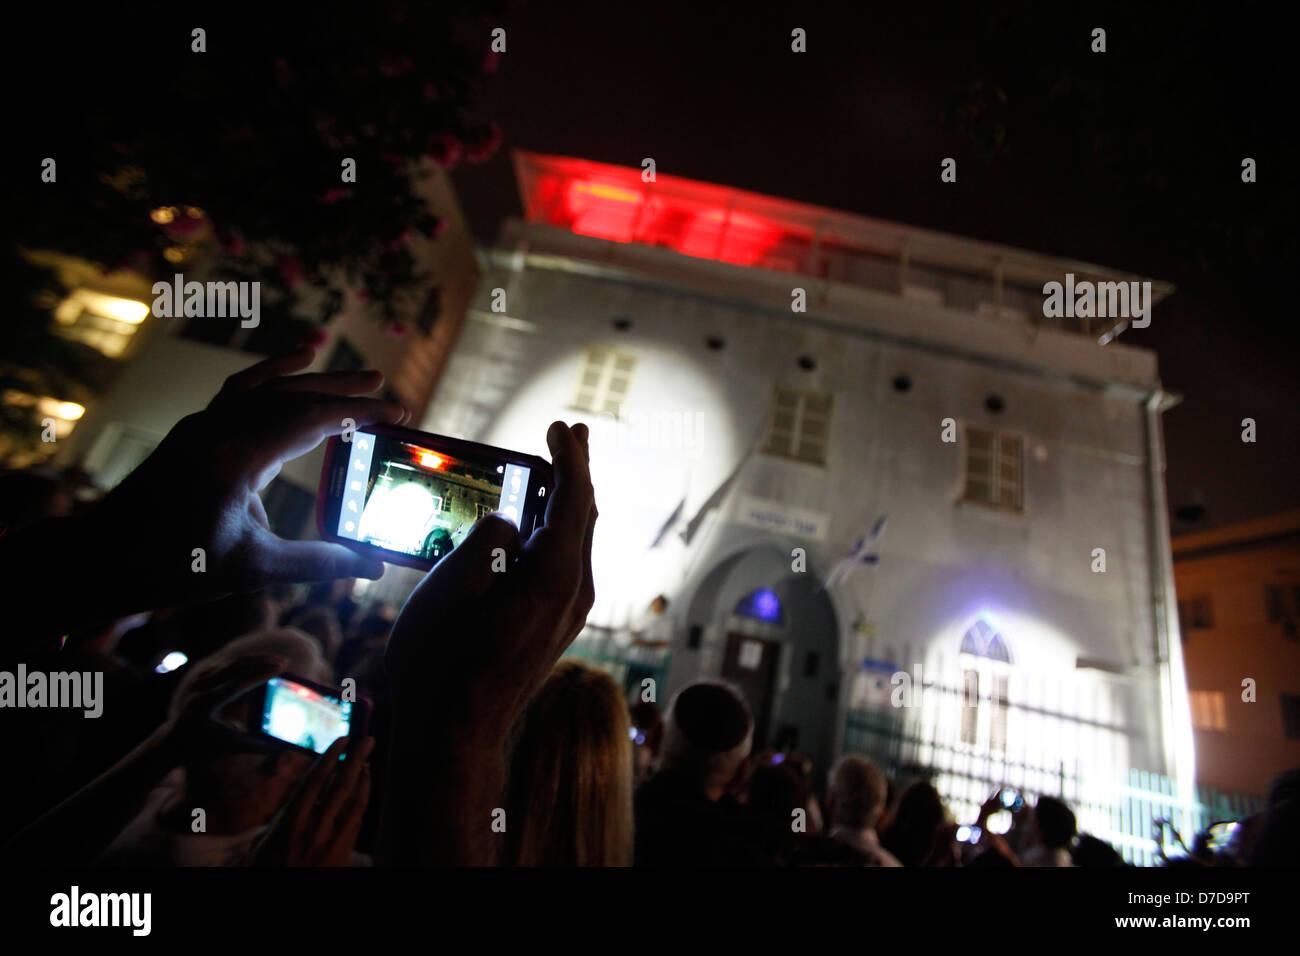 Guerrilla Lighting event in downtown Tel Aviv israel - Stock Image